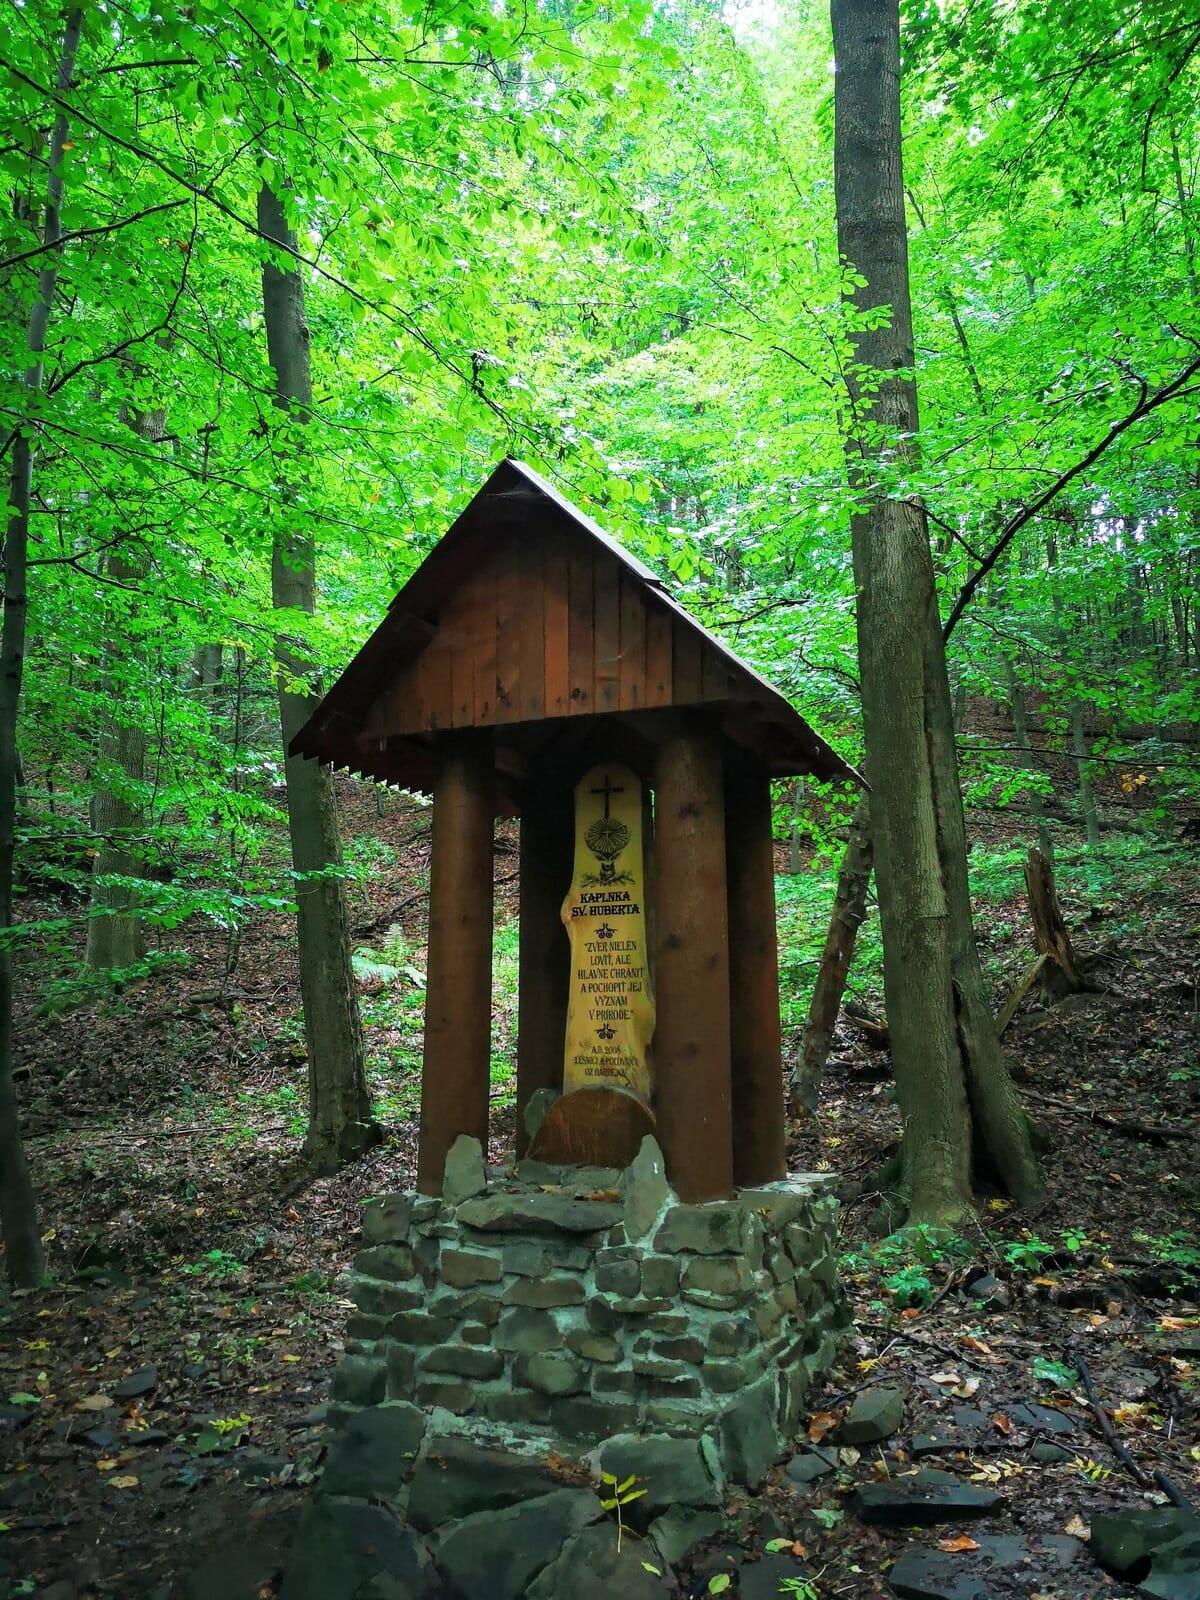 Kaplnka sv. Huberta – náučný chodník Čierna mláka